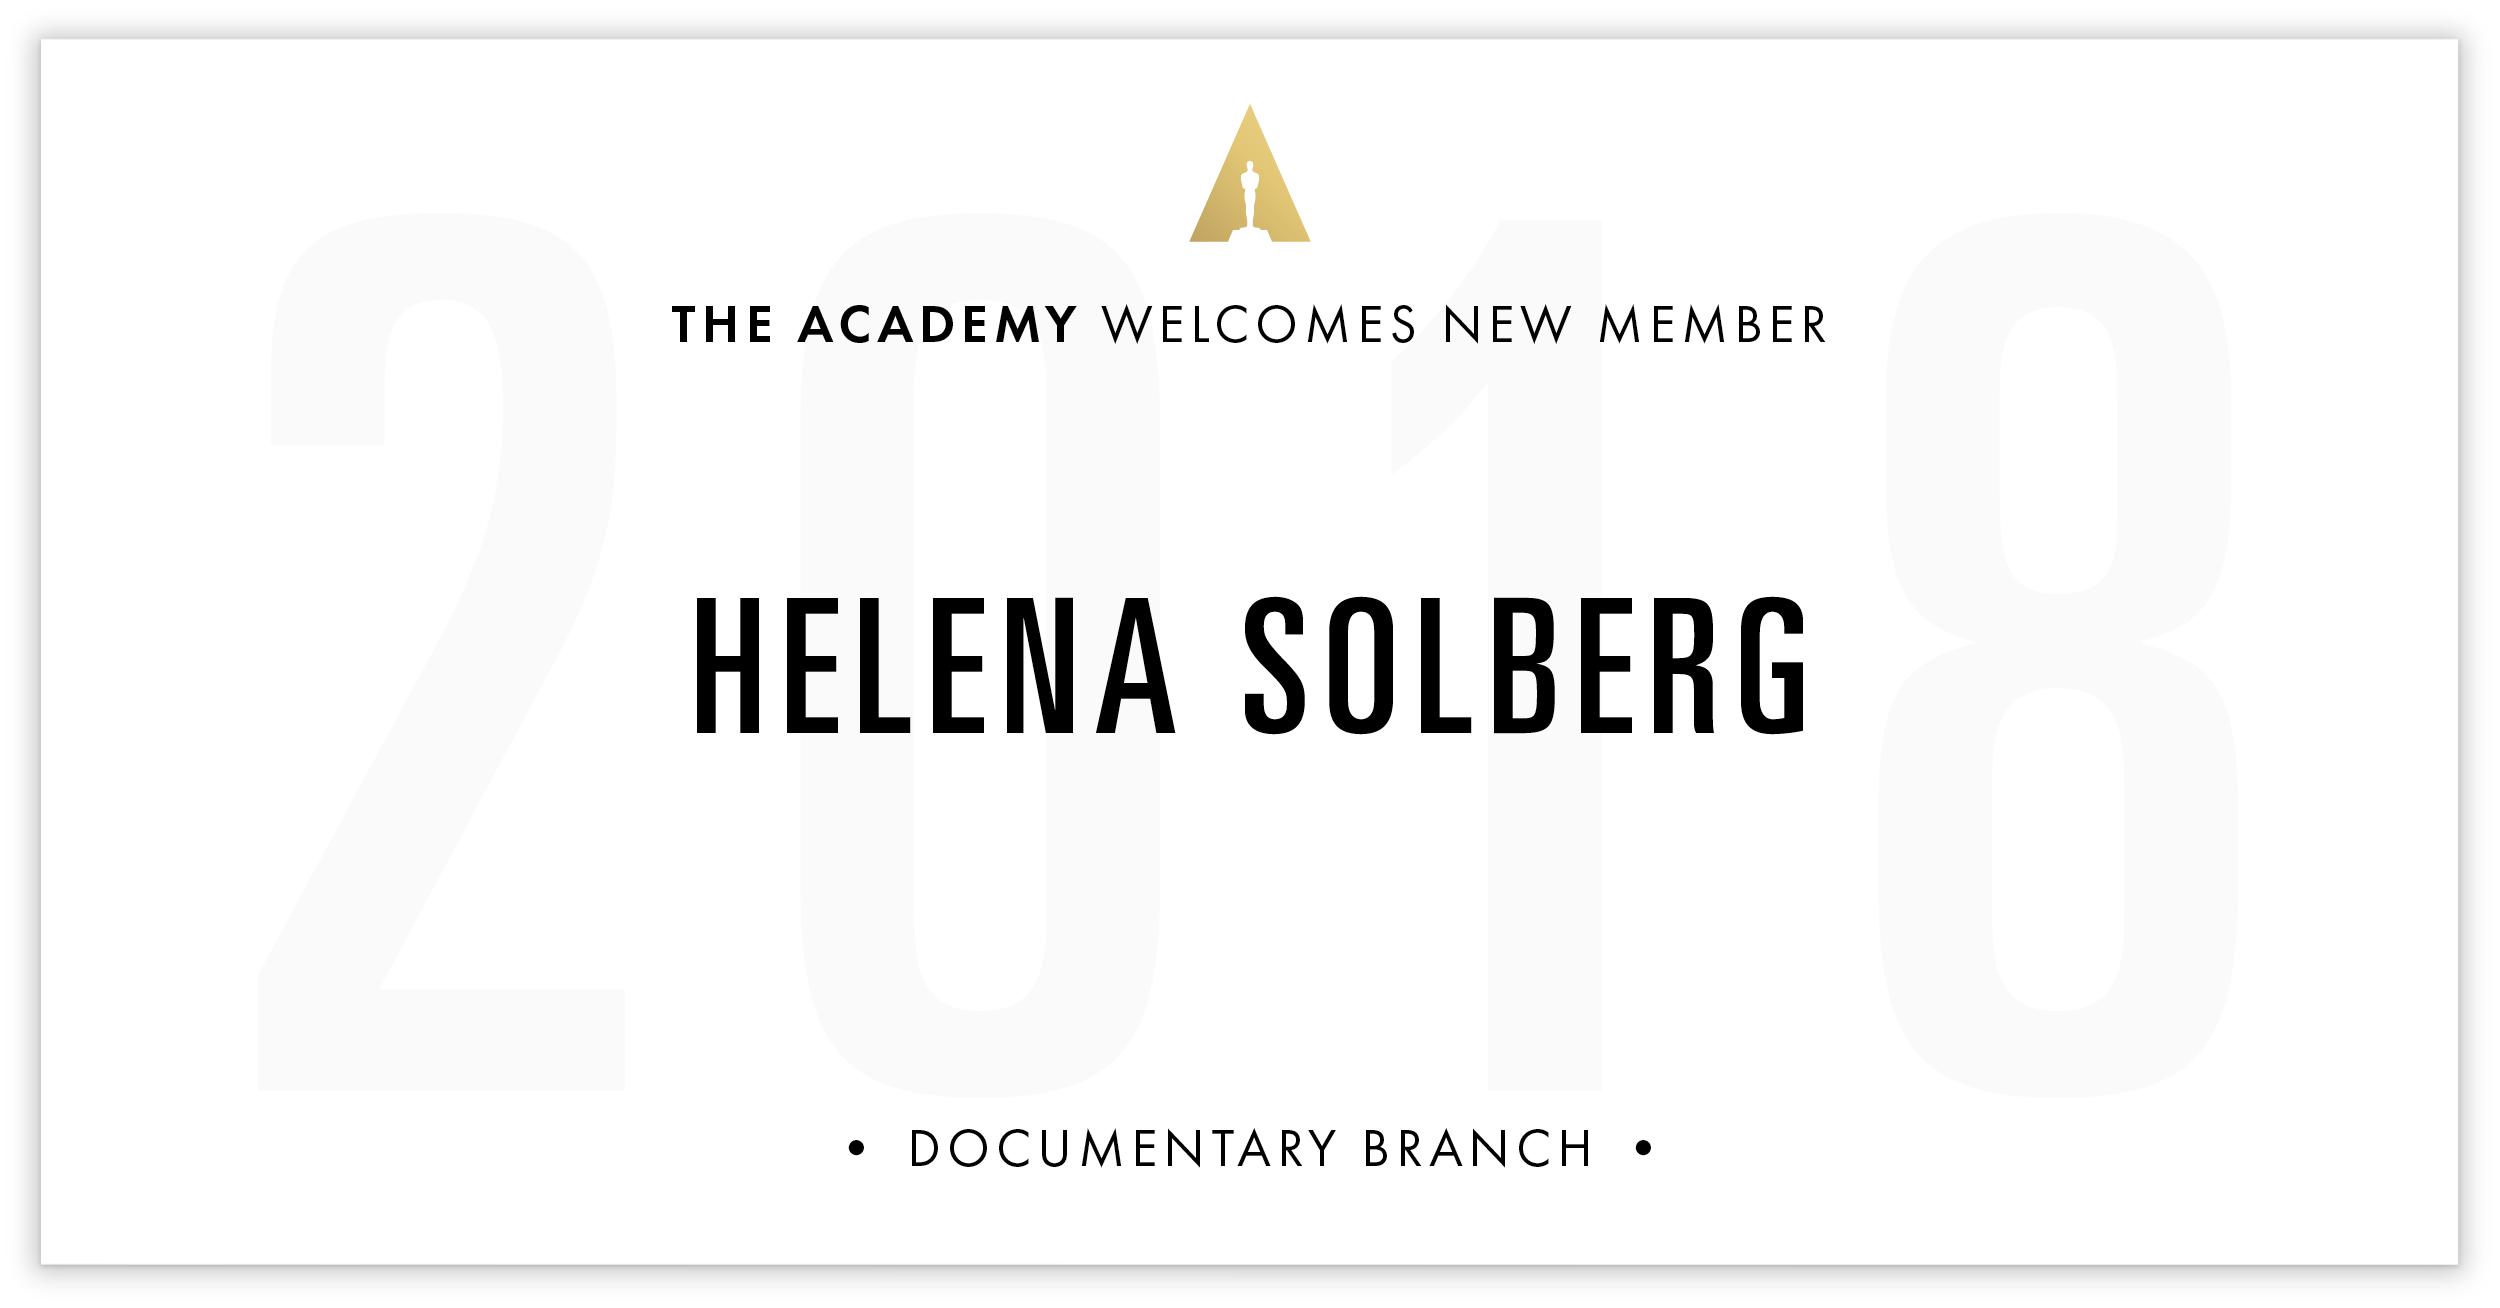 Helena Solberg is invited!